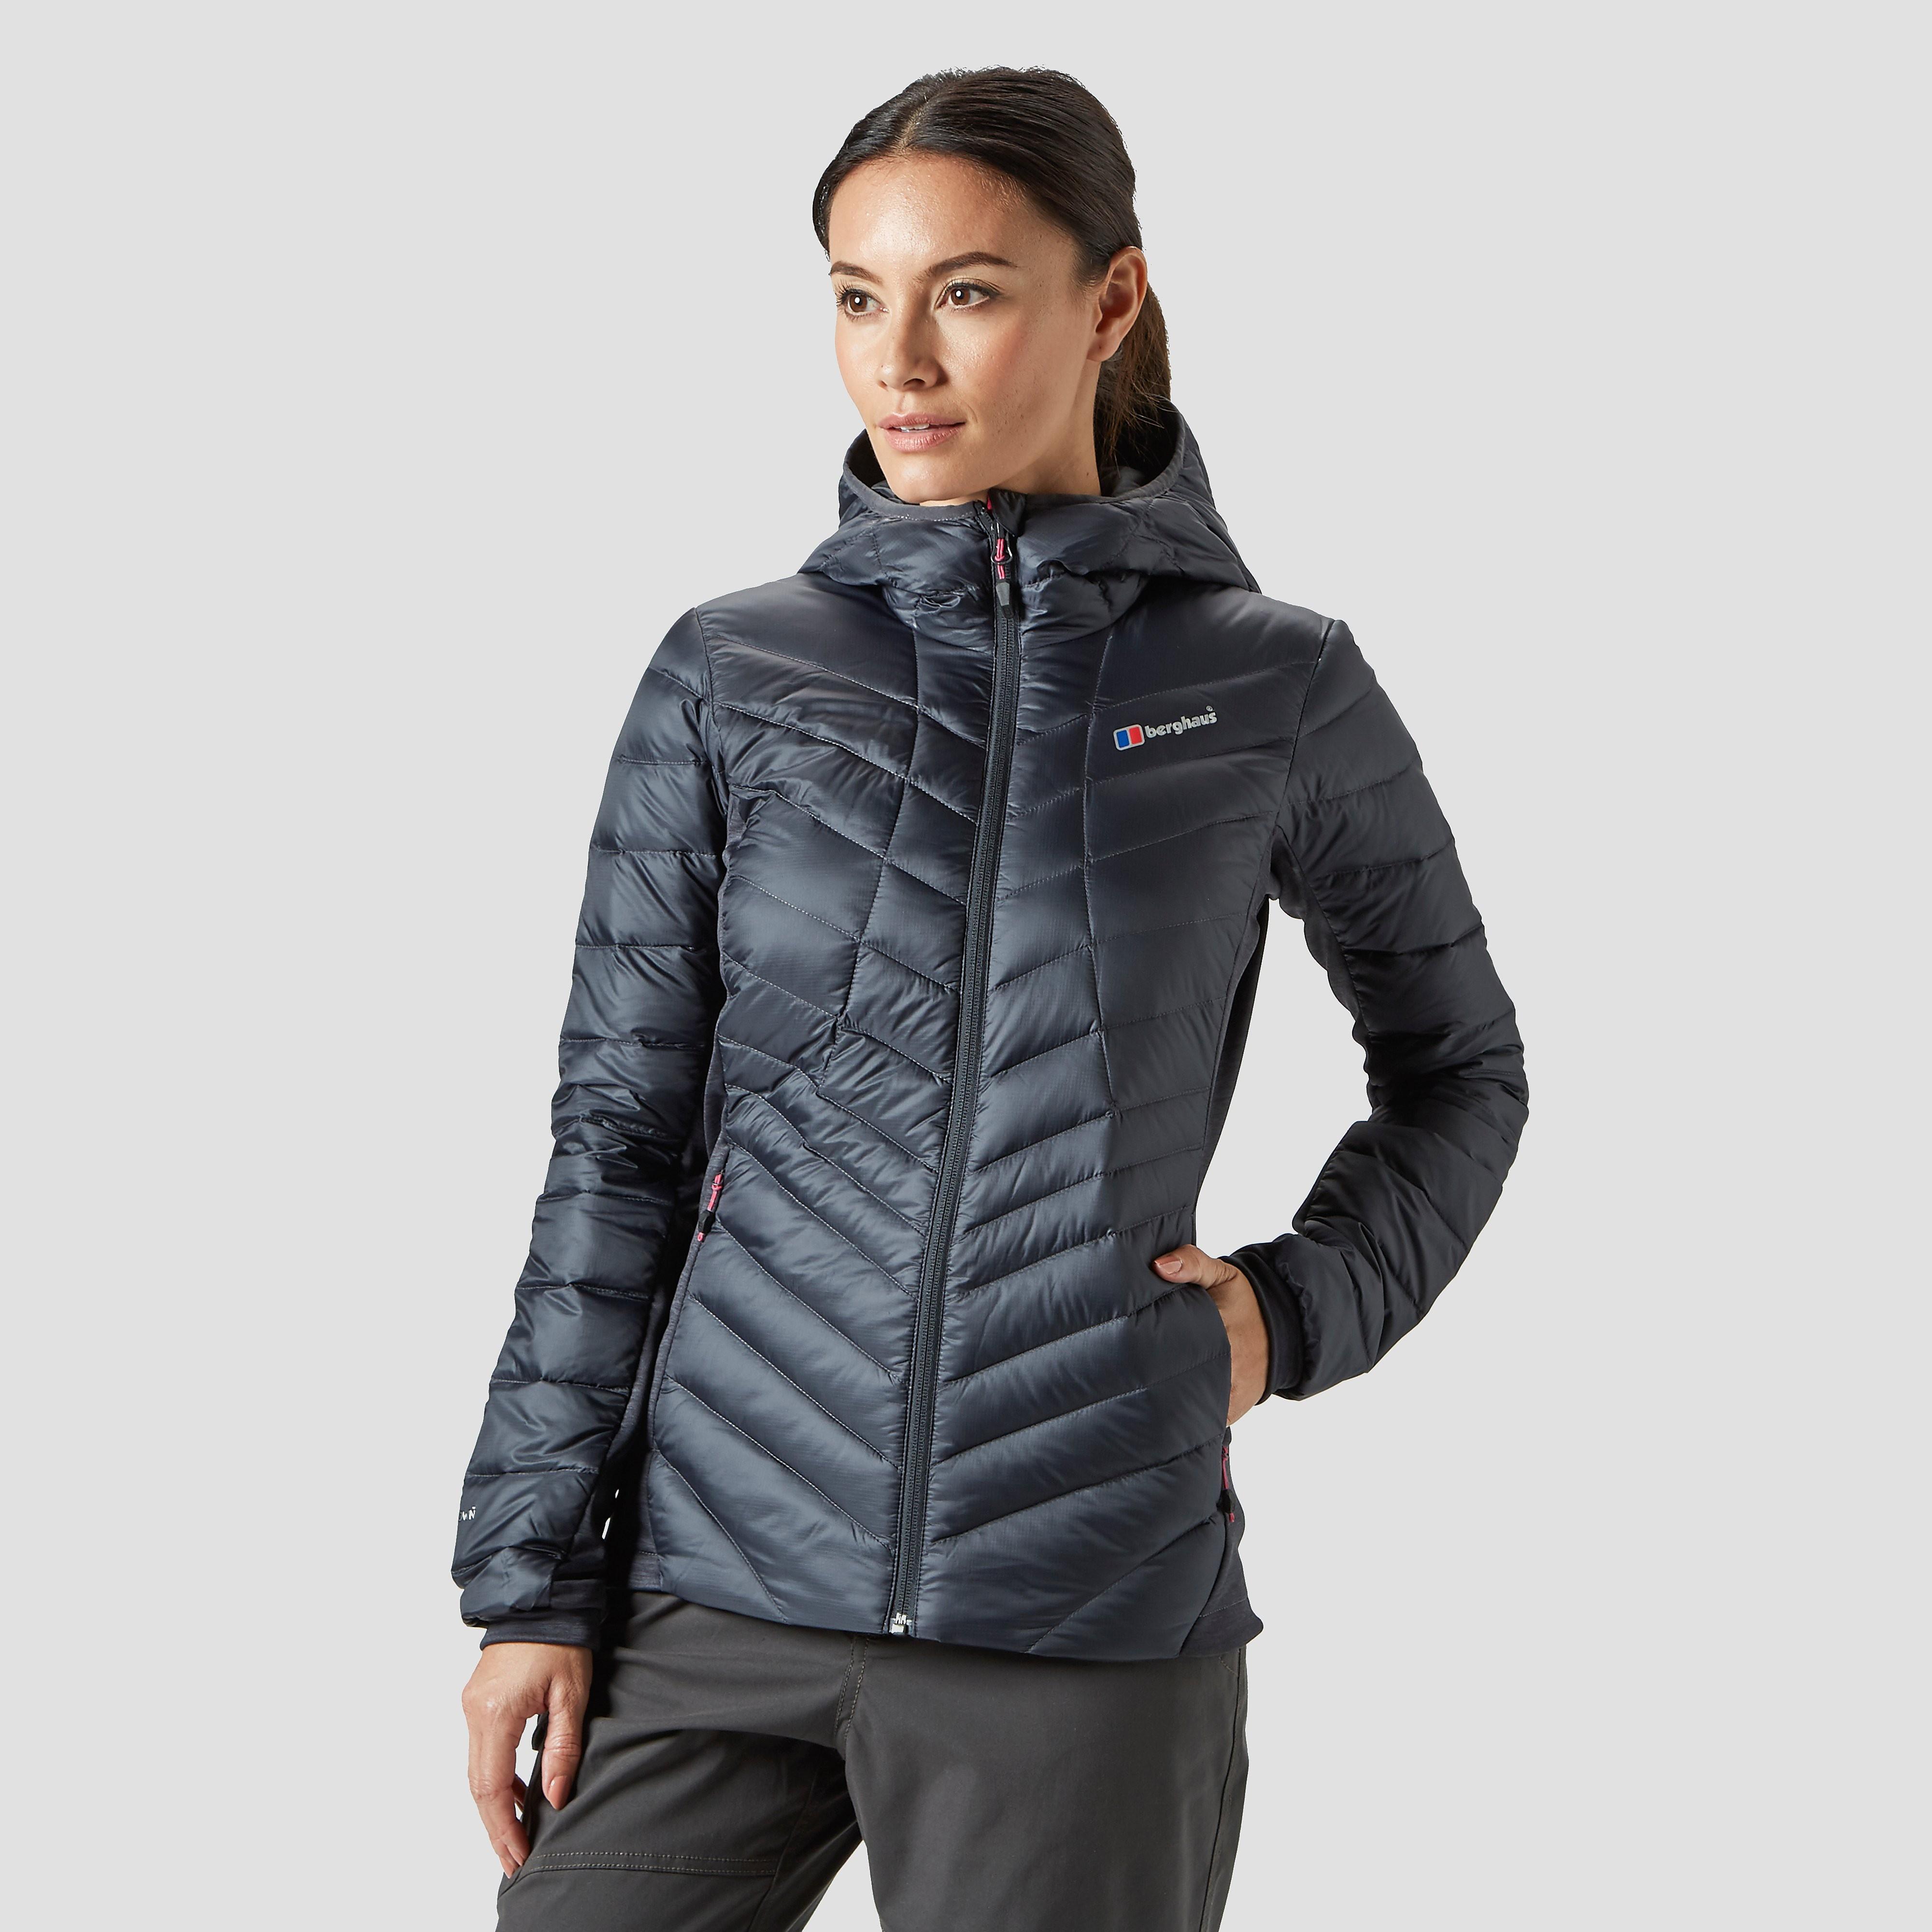 Berghaus Women's Tephra Stretch Jacket